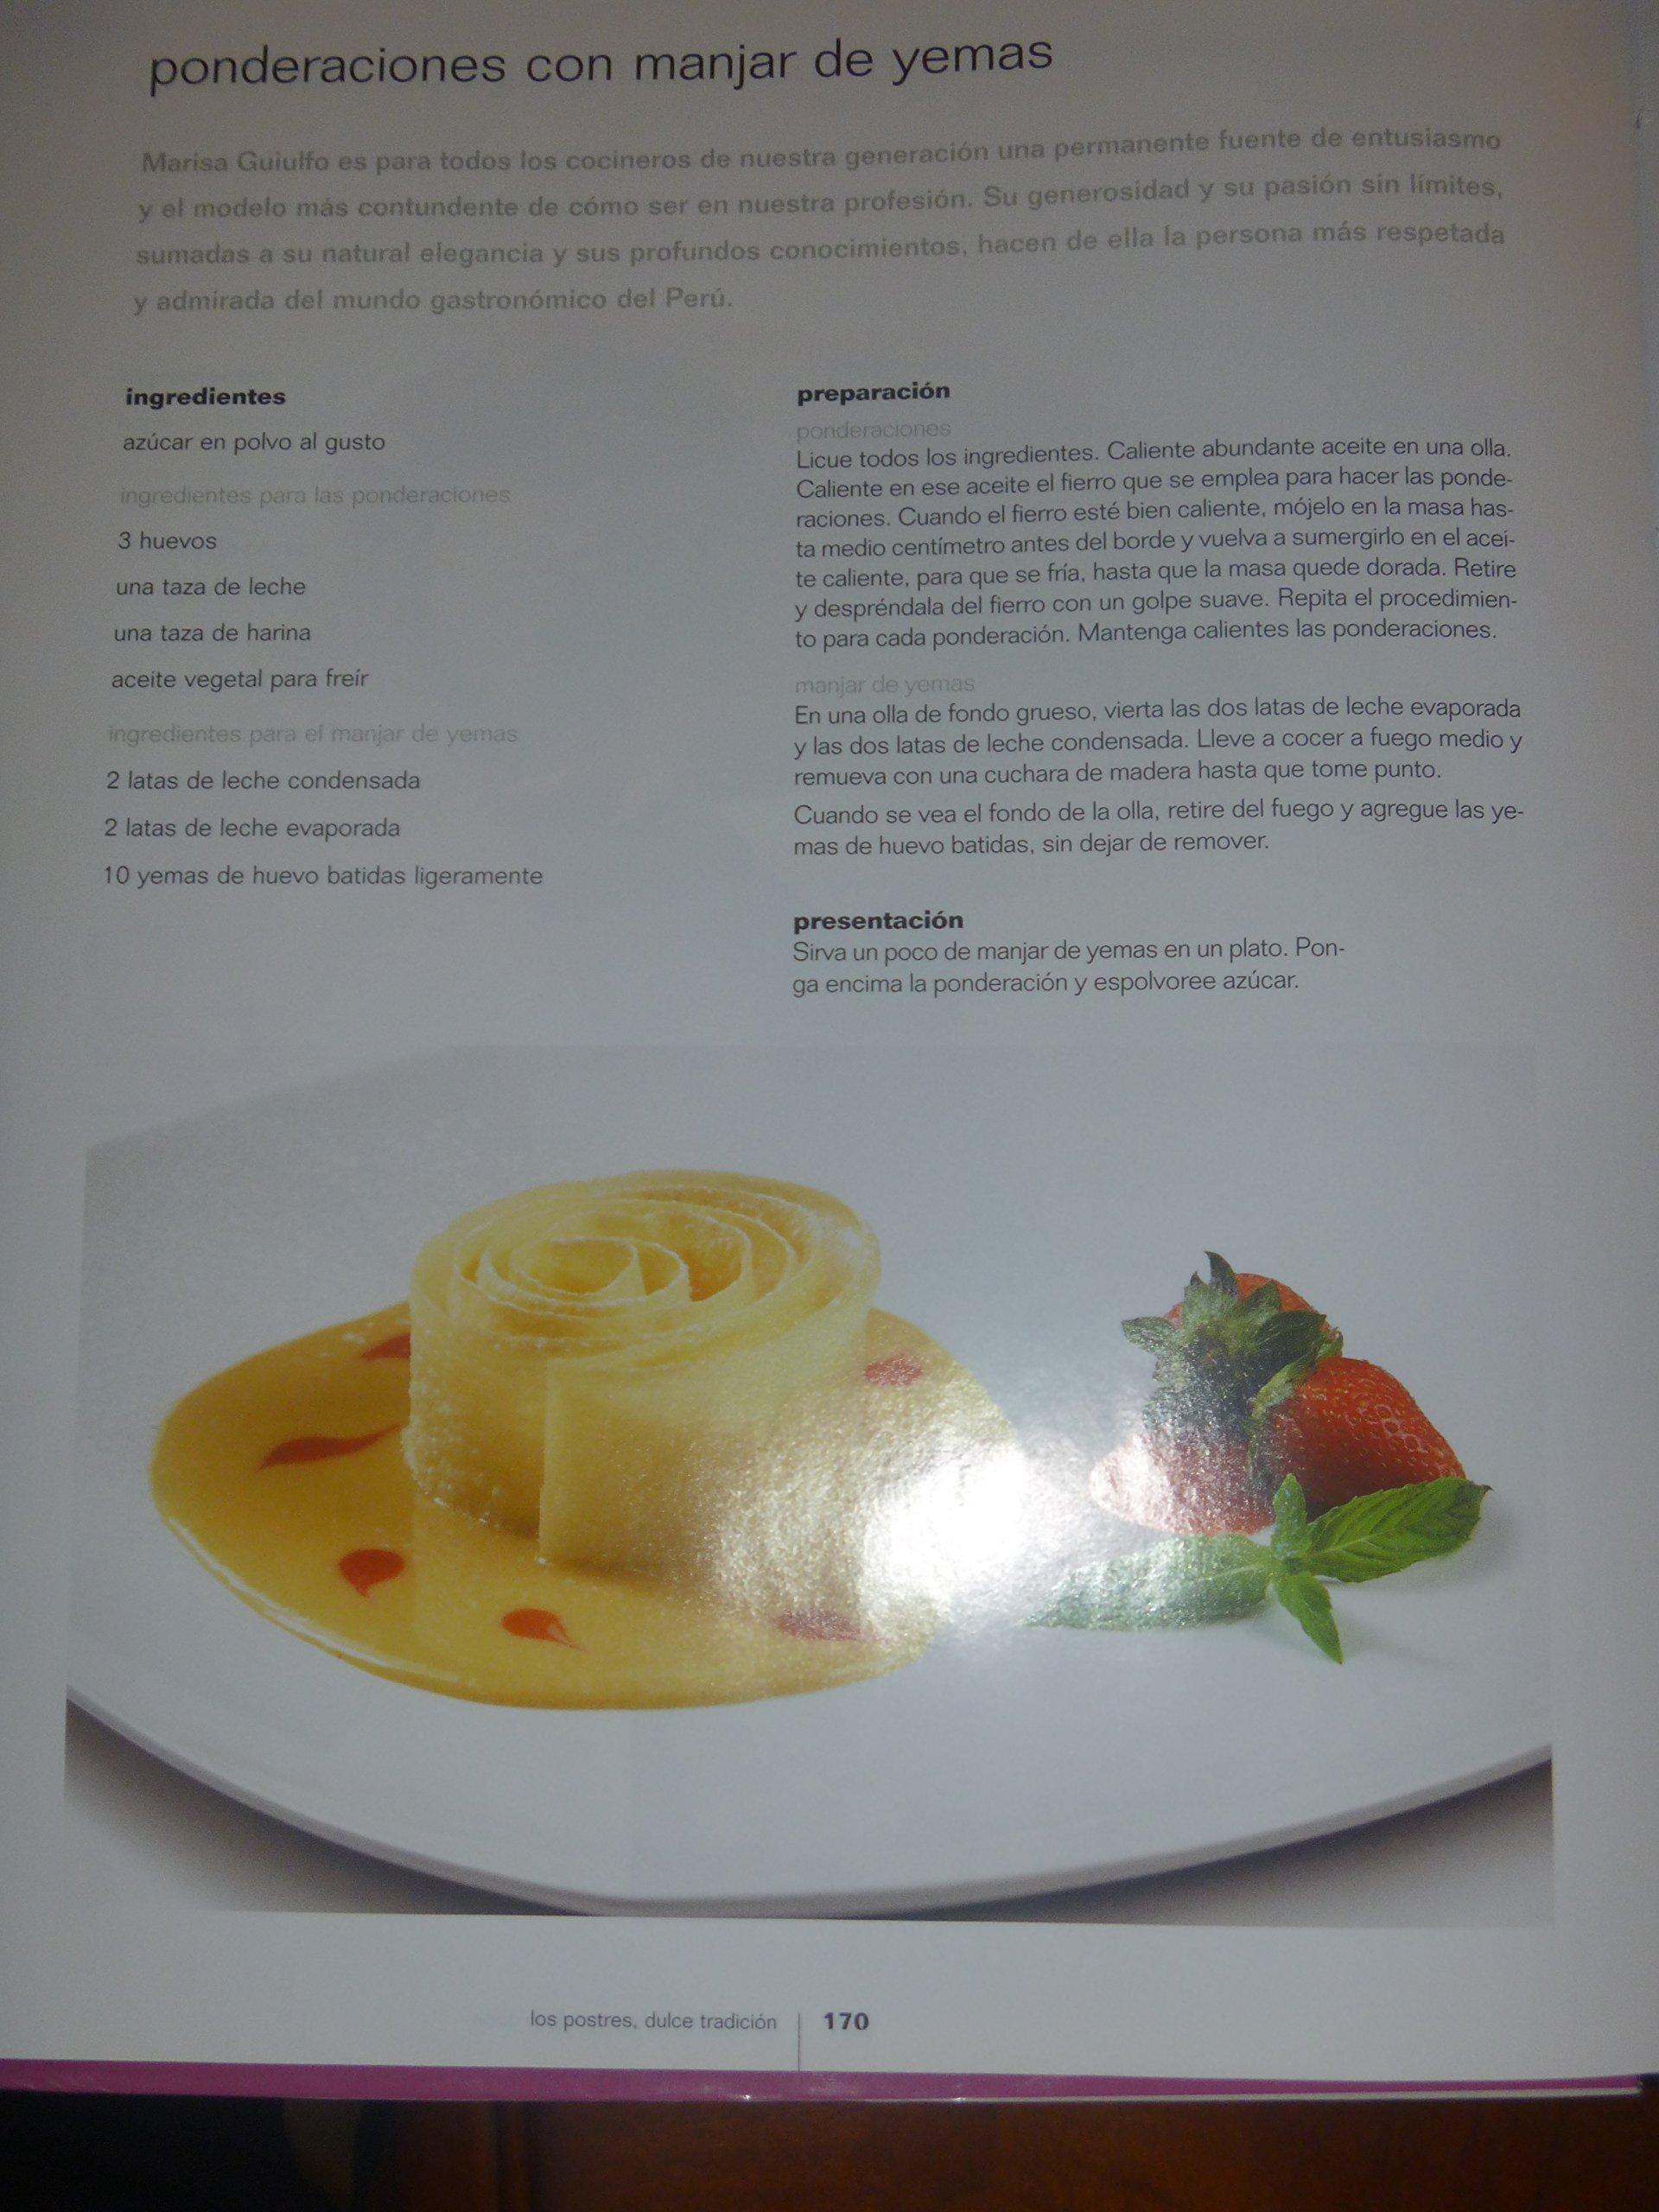 Los Postres Dulce Tradicion: Gaston Acurio Jaramillo: 9789972205590: Amazon.com: Books